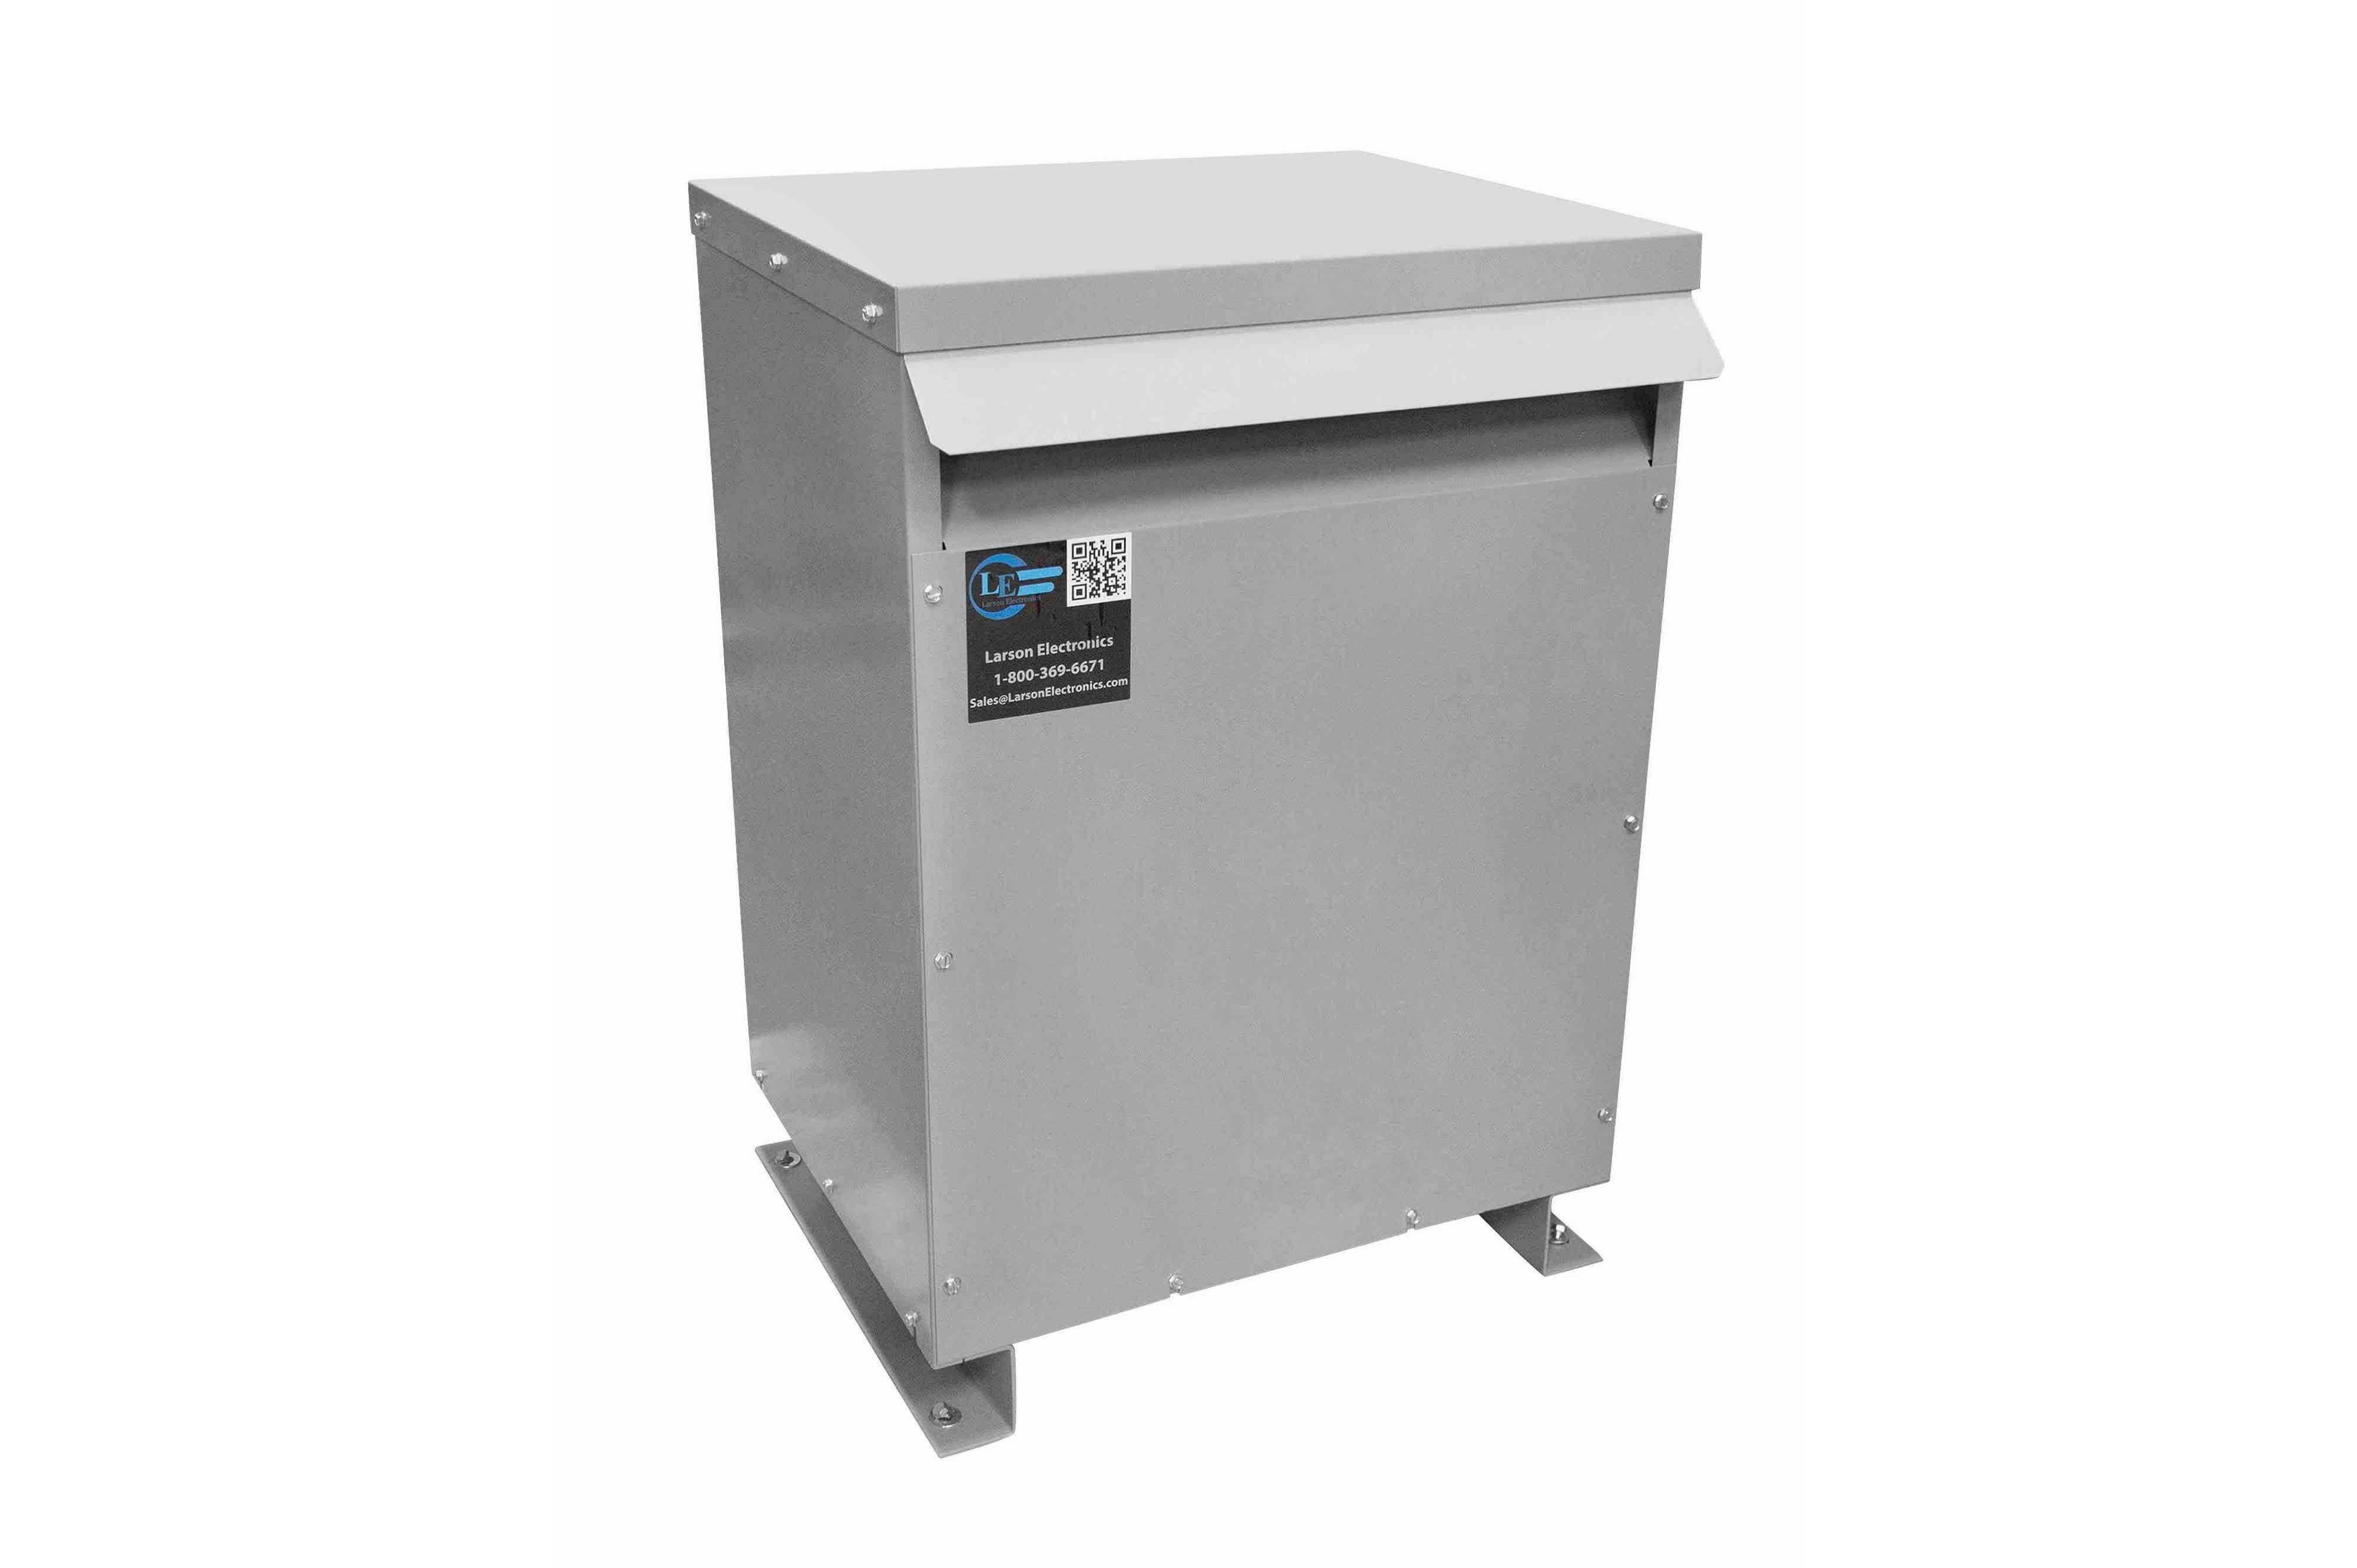 275 kVA 3PH Isolation Transformer, 600V Wye Primary, 240V/120 Delta Secondary, N3R, Ventilated, 60 Hz